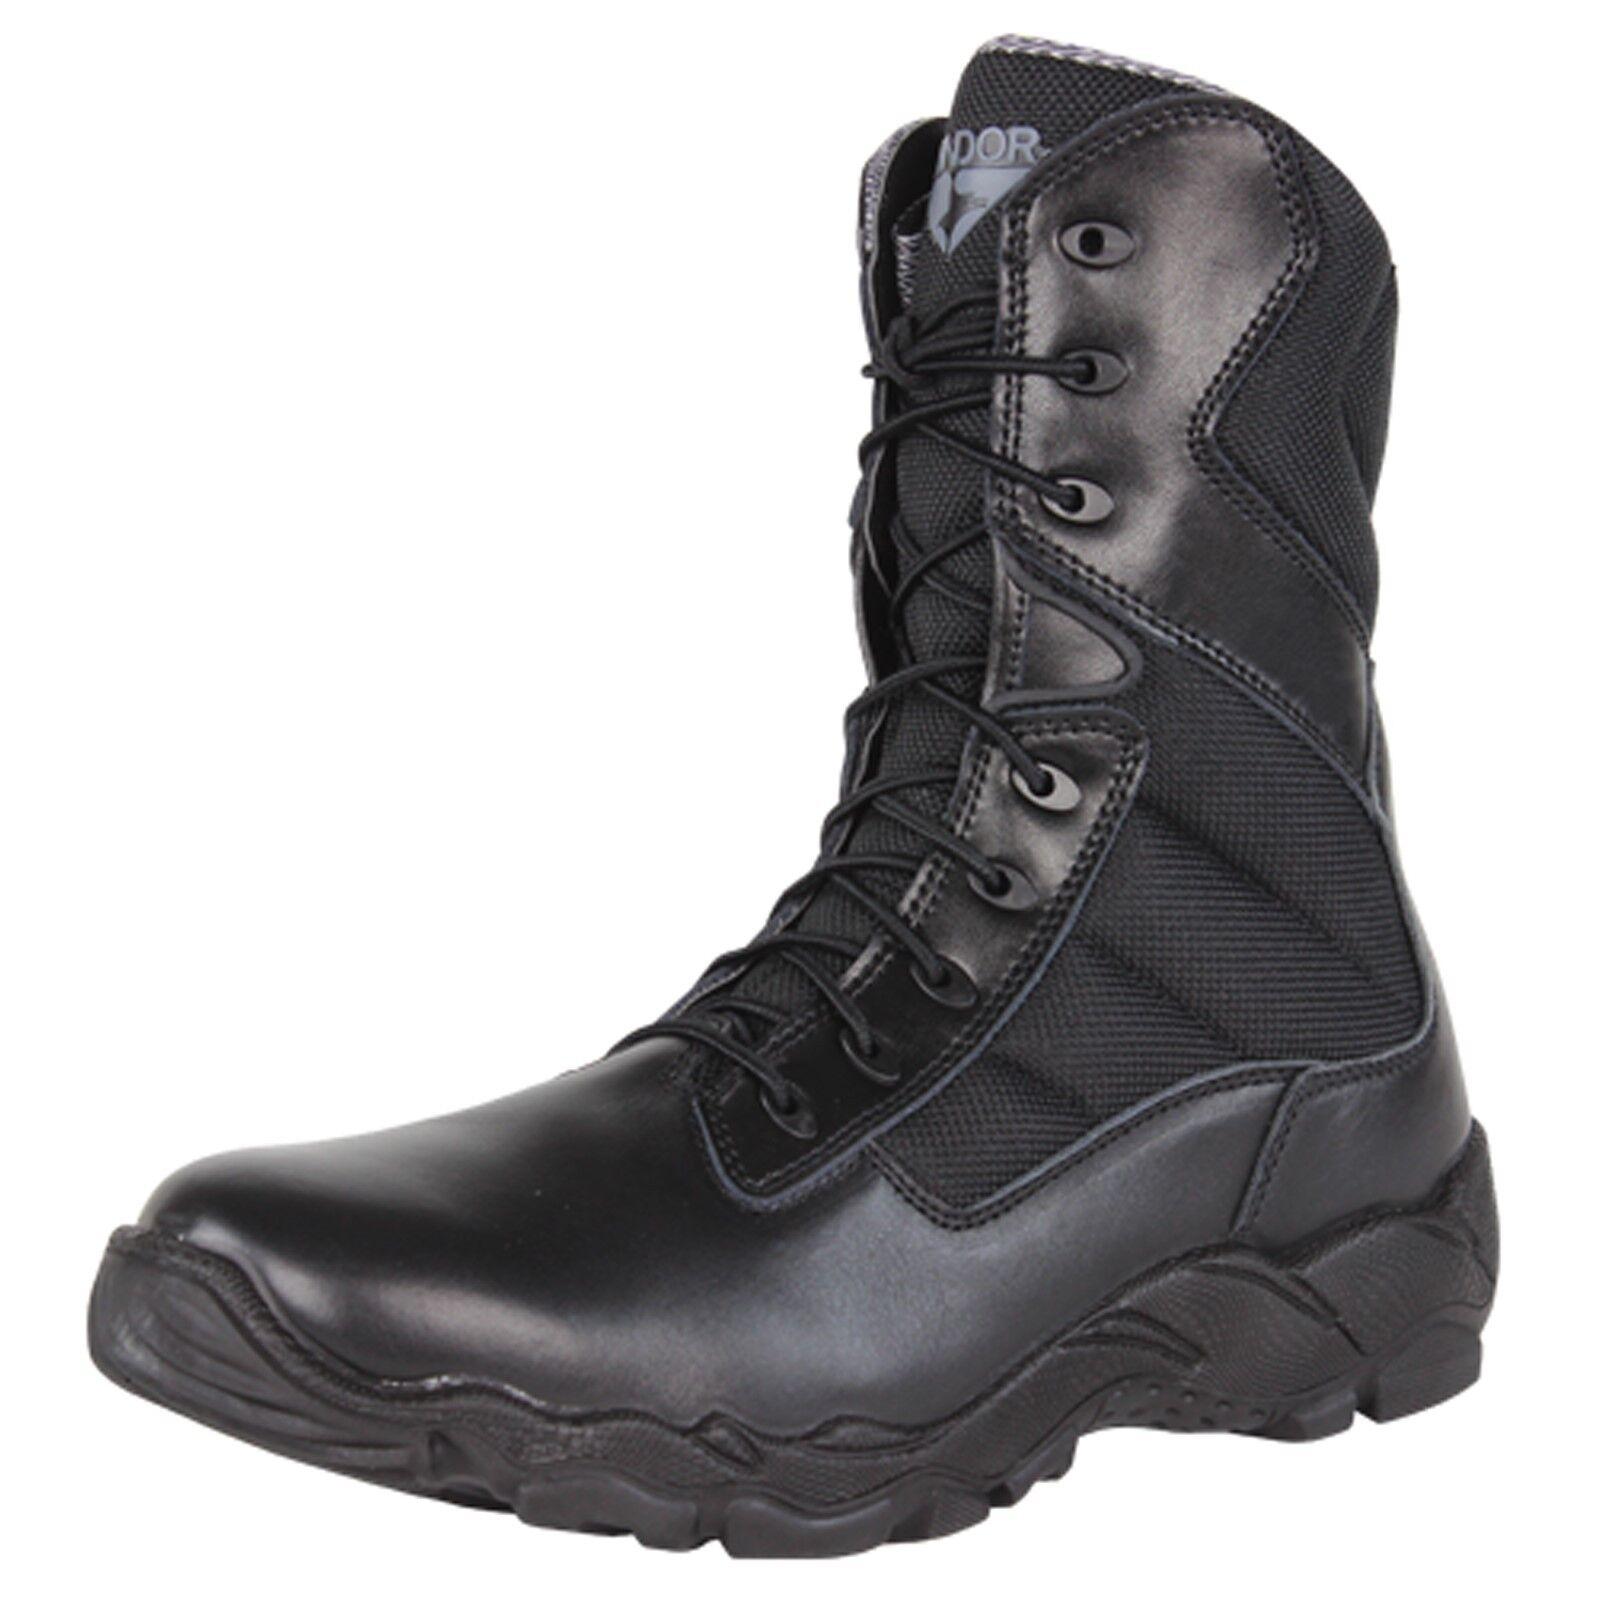 Condor Bailey Law aplicación táctica de Combate Militar botas de tobillo alto-negro